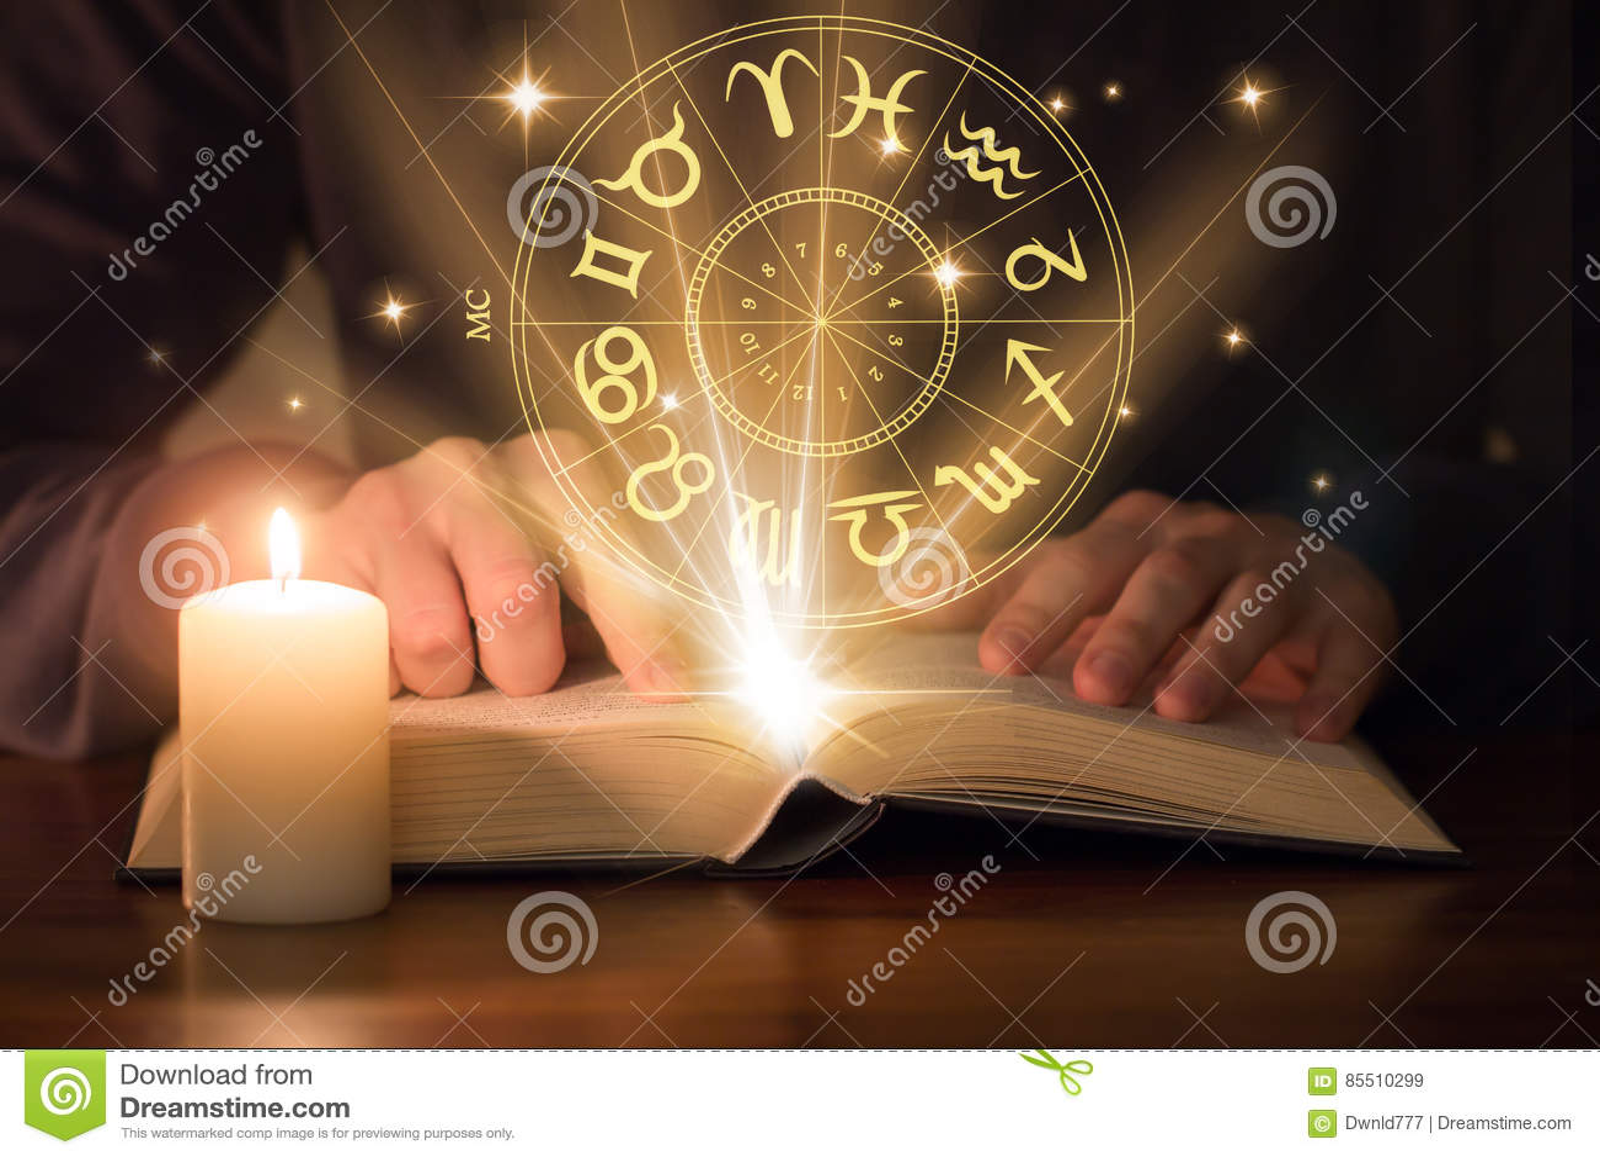 人读书占星术书